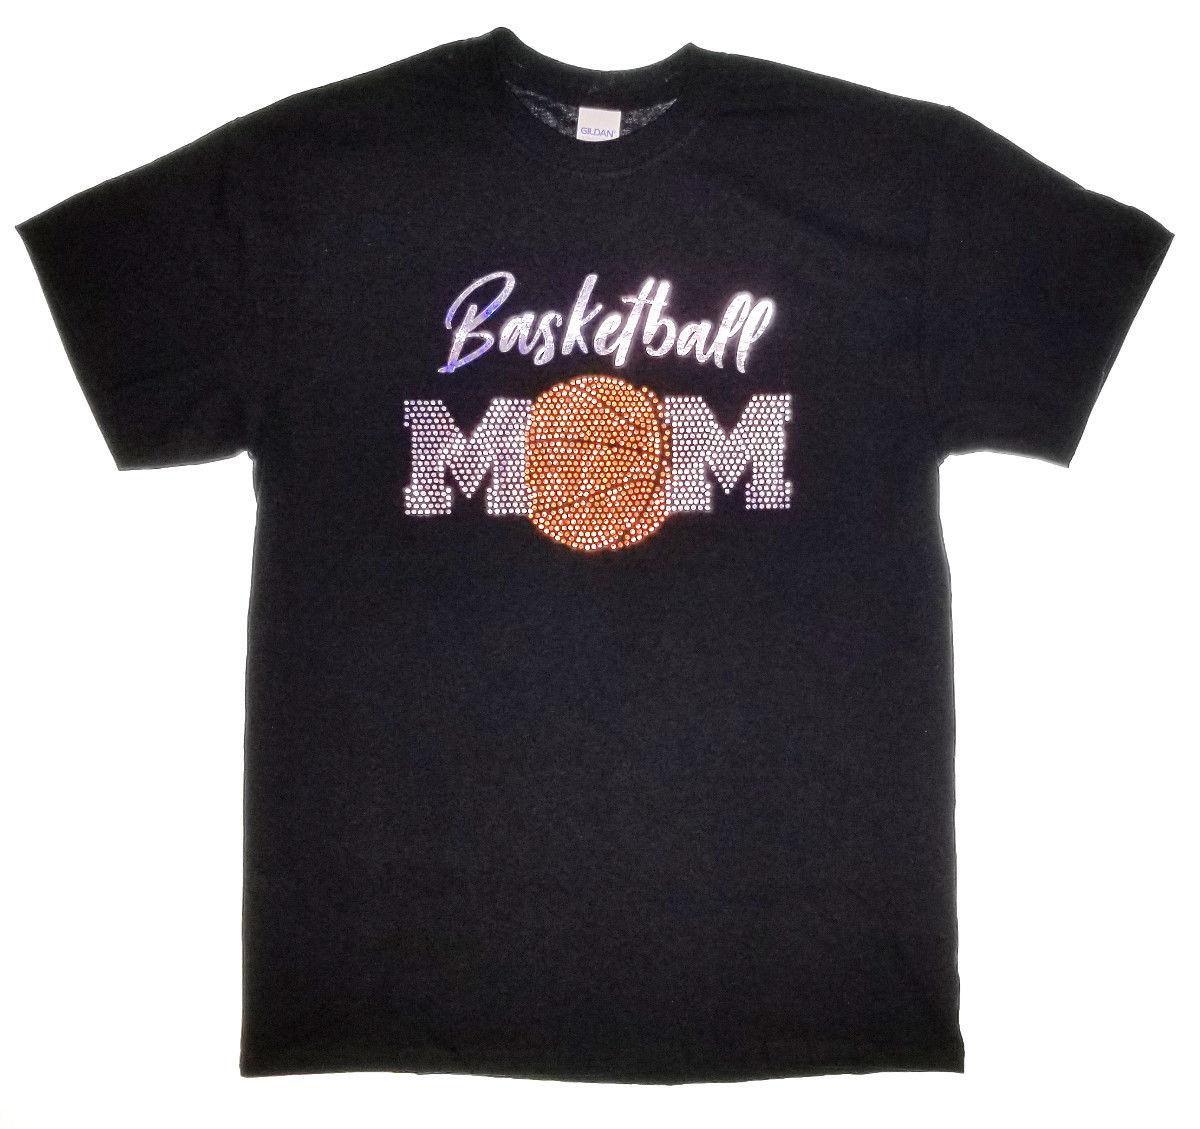 Customizing Shirts with Spangles